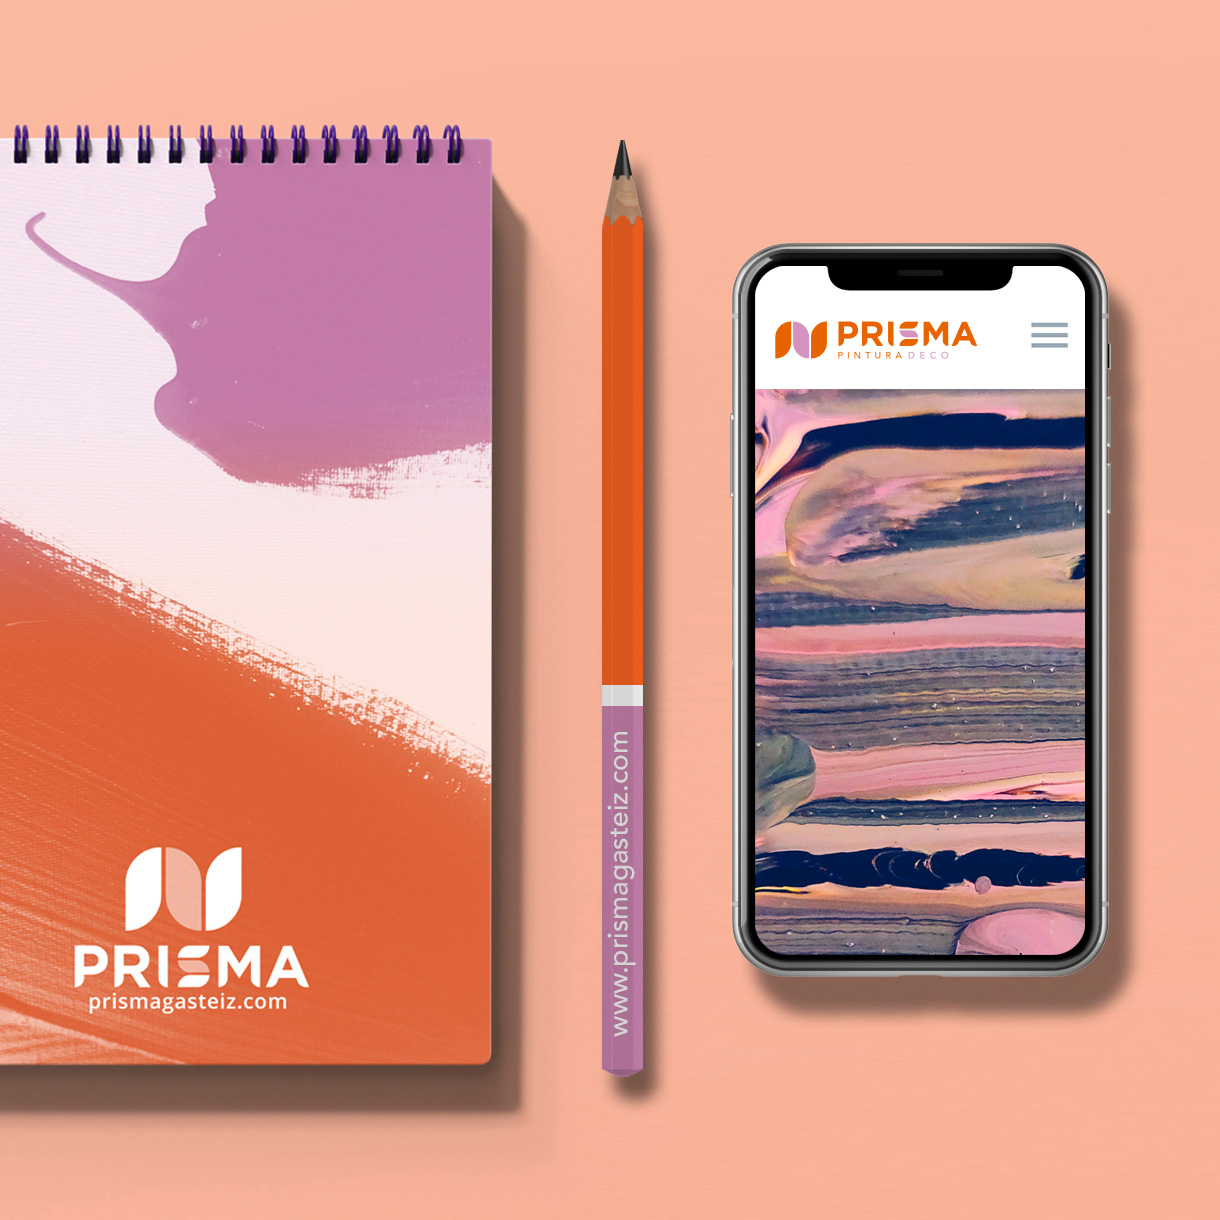 Prisma, renovación de marca